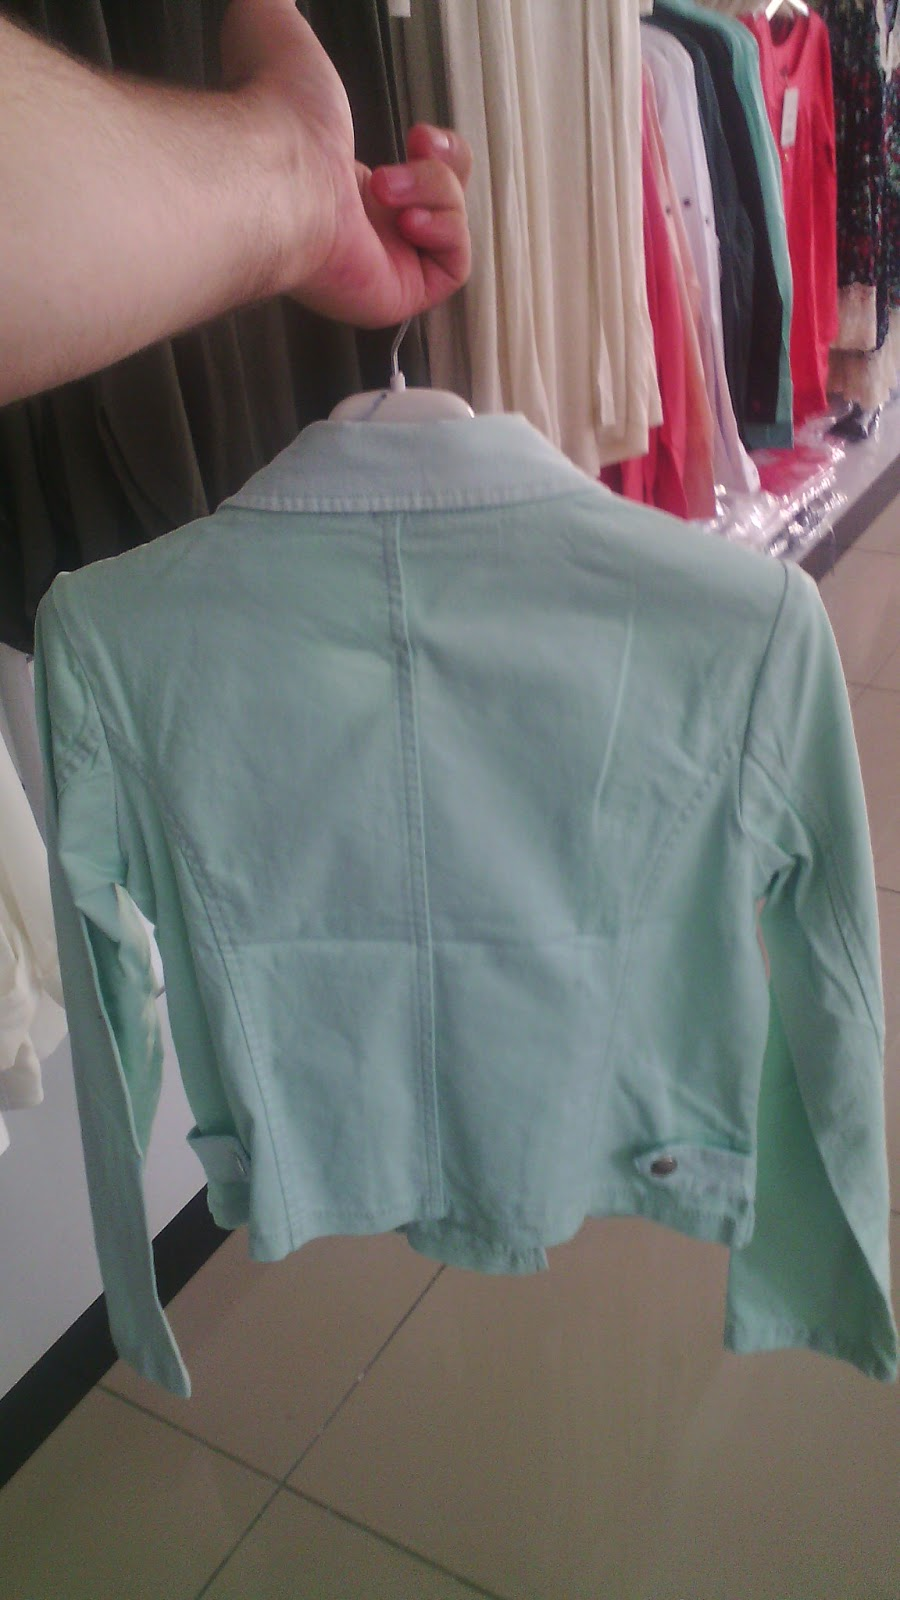 tekstil firmalar - bayan giyim